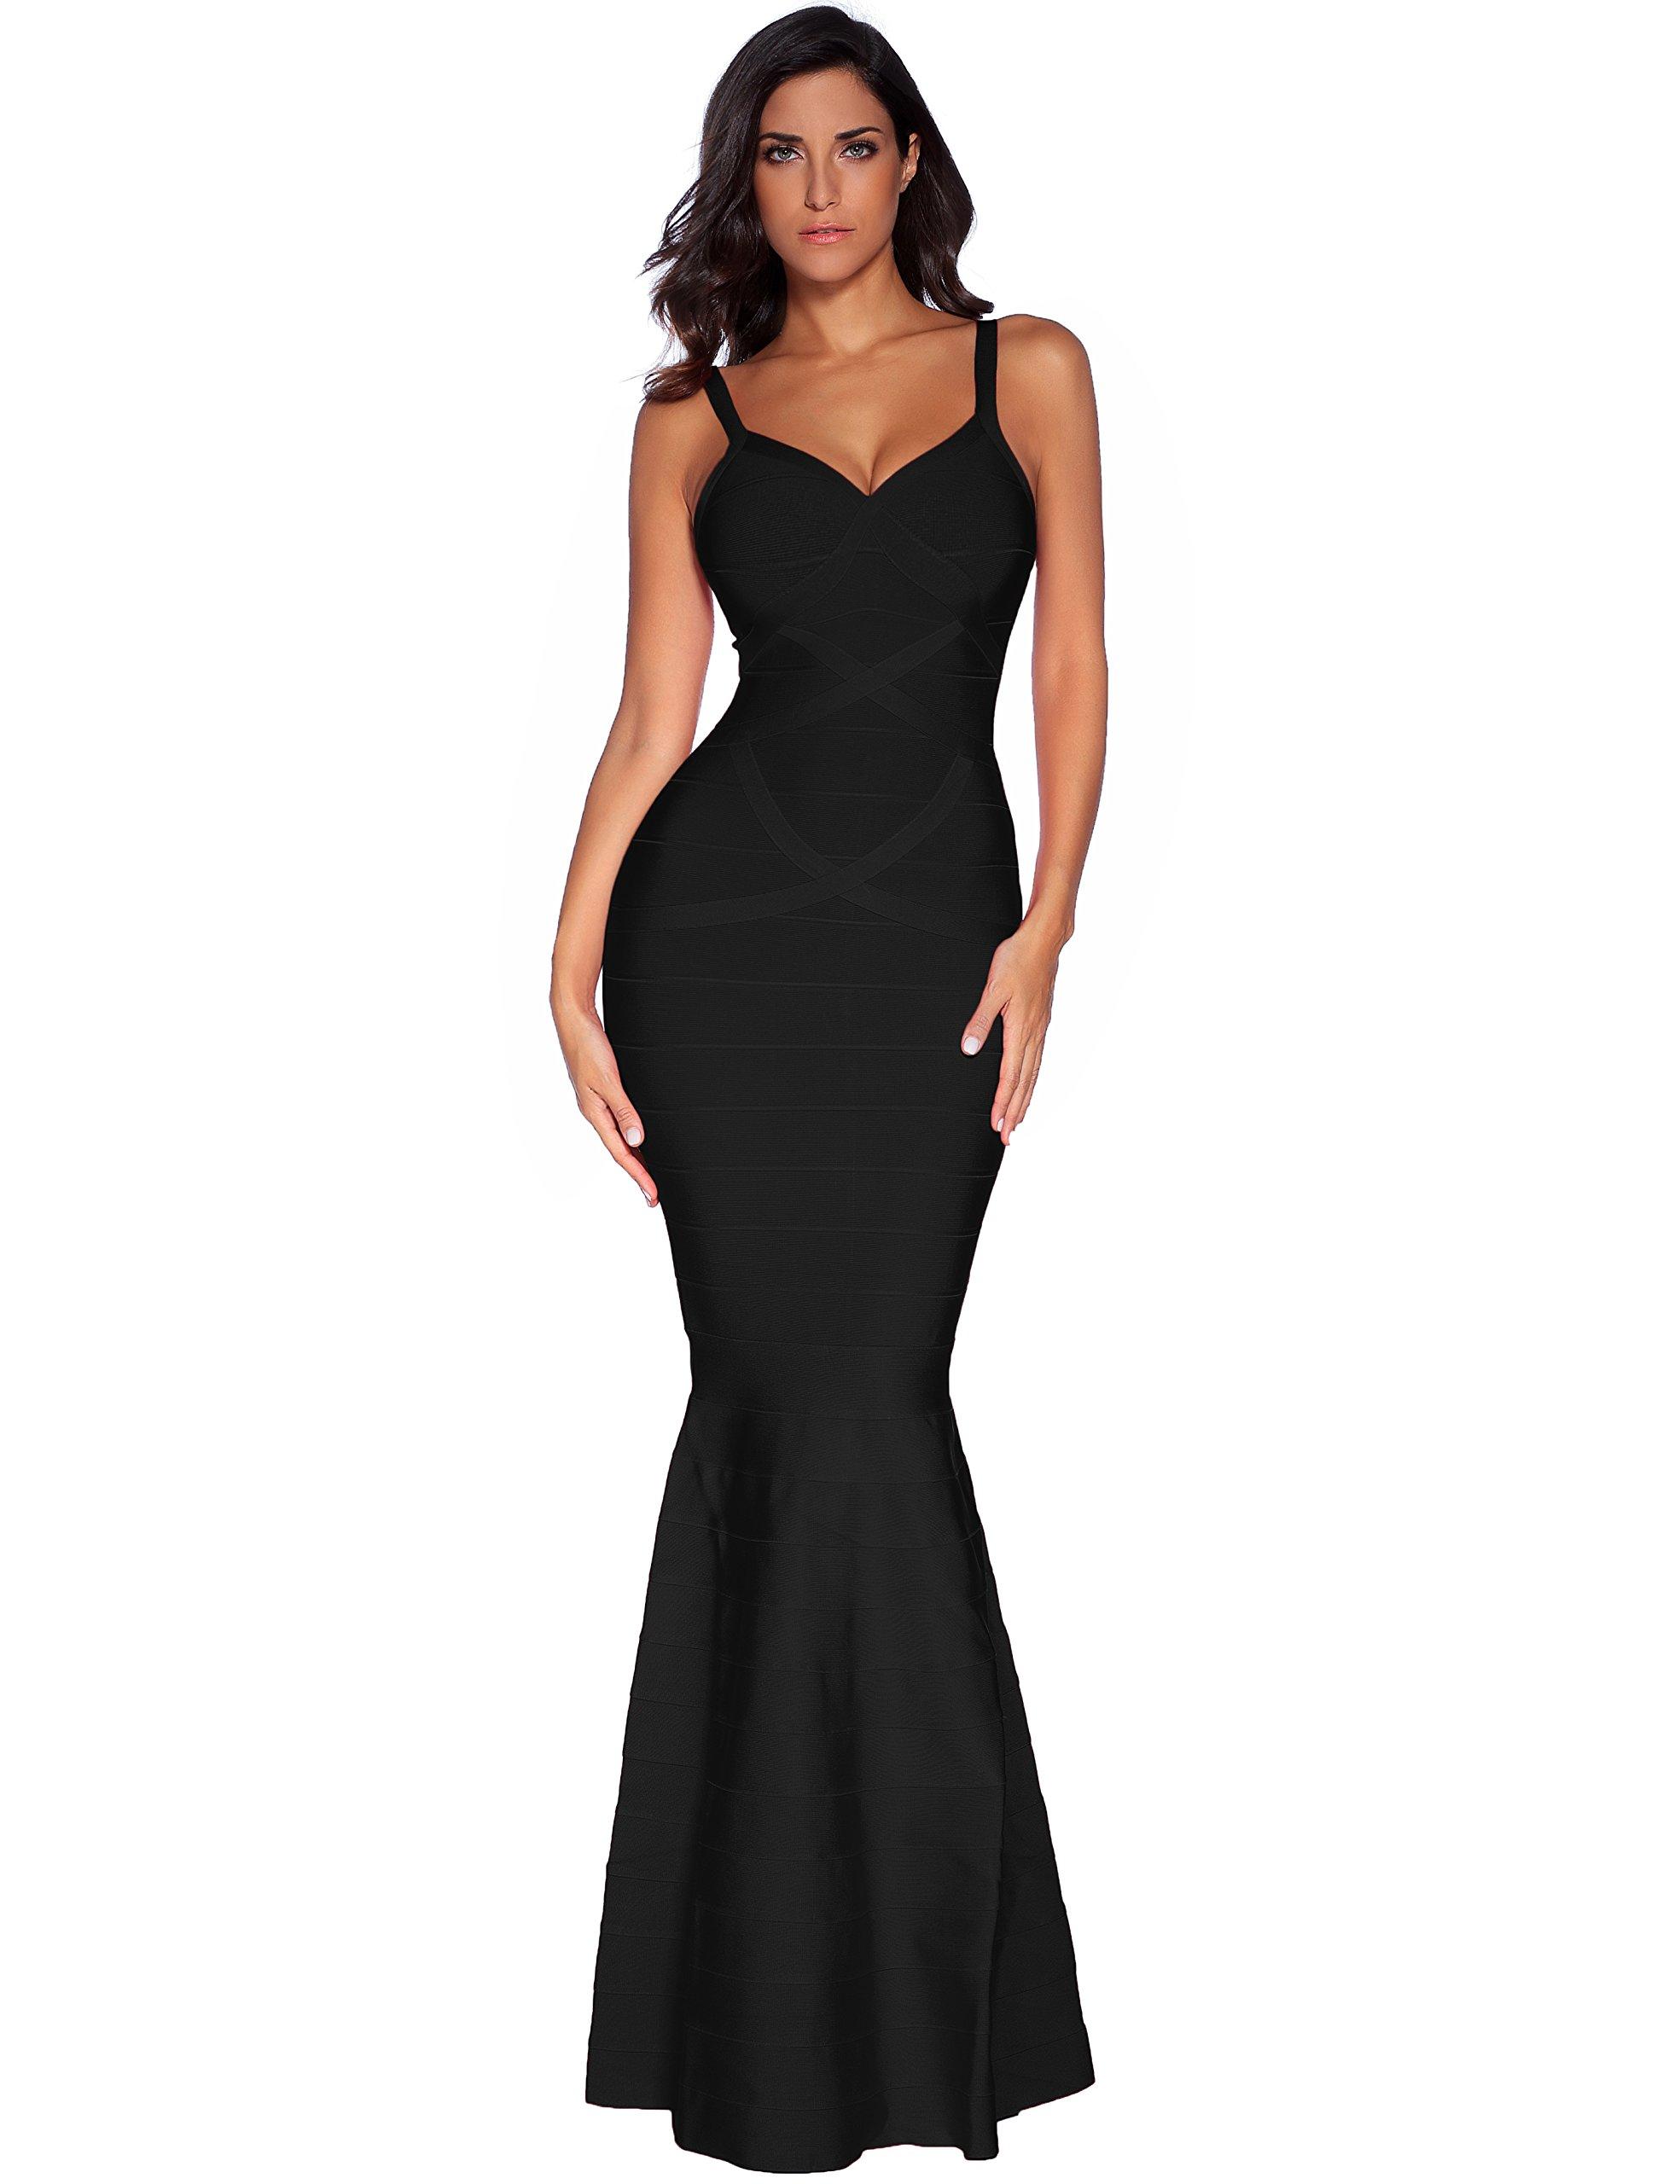 Meilun Womens Sleeveless Maxi Bandage Dress Strap Swing Dress X-Small Black